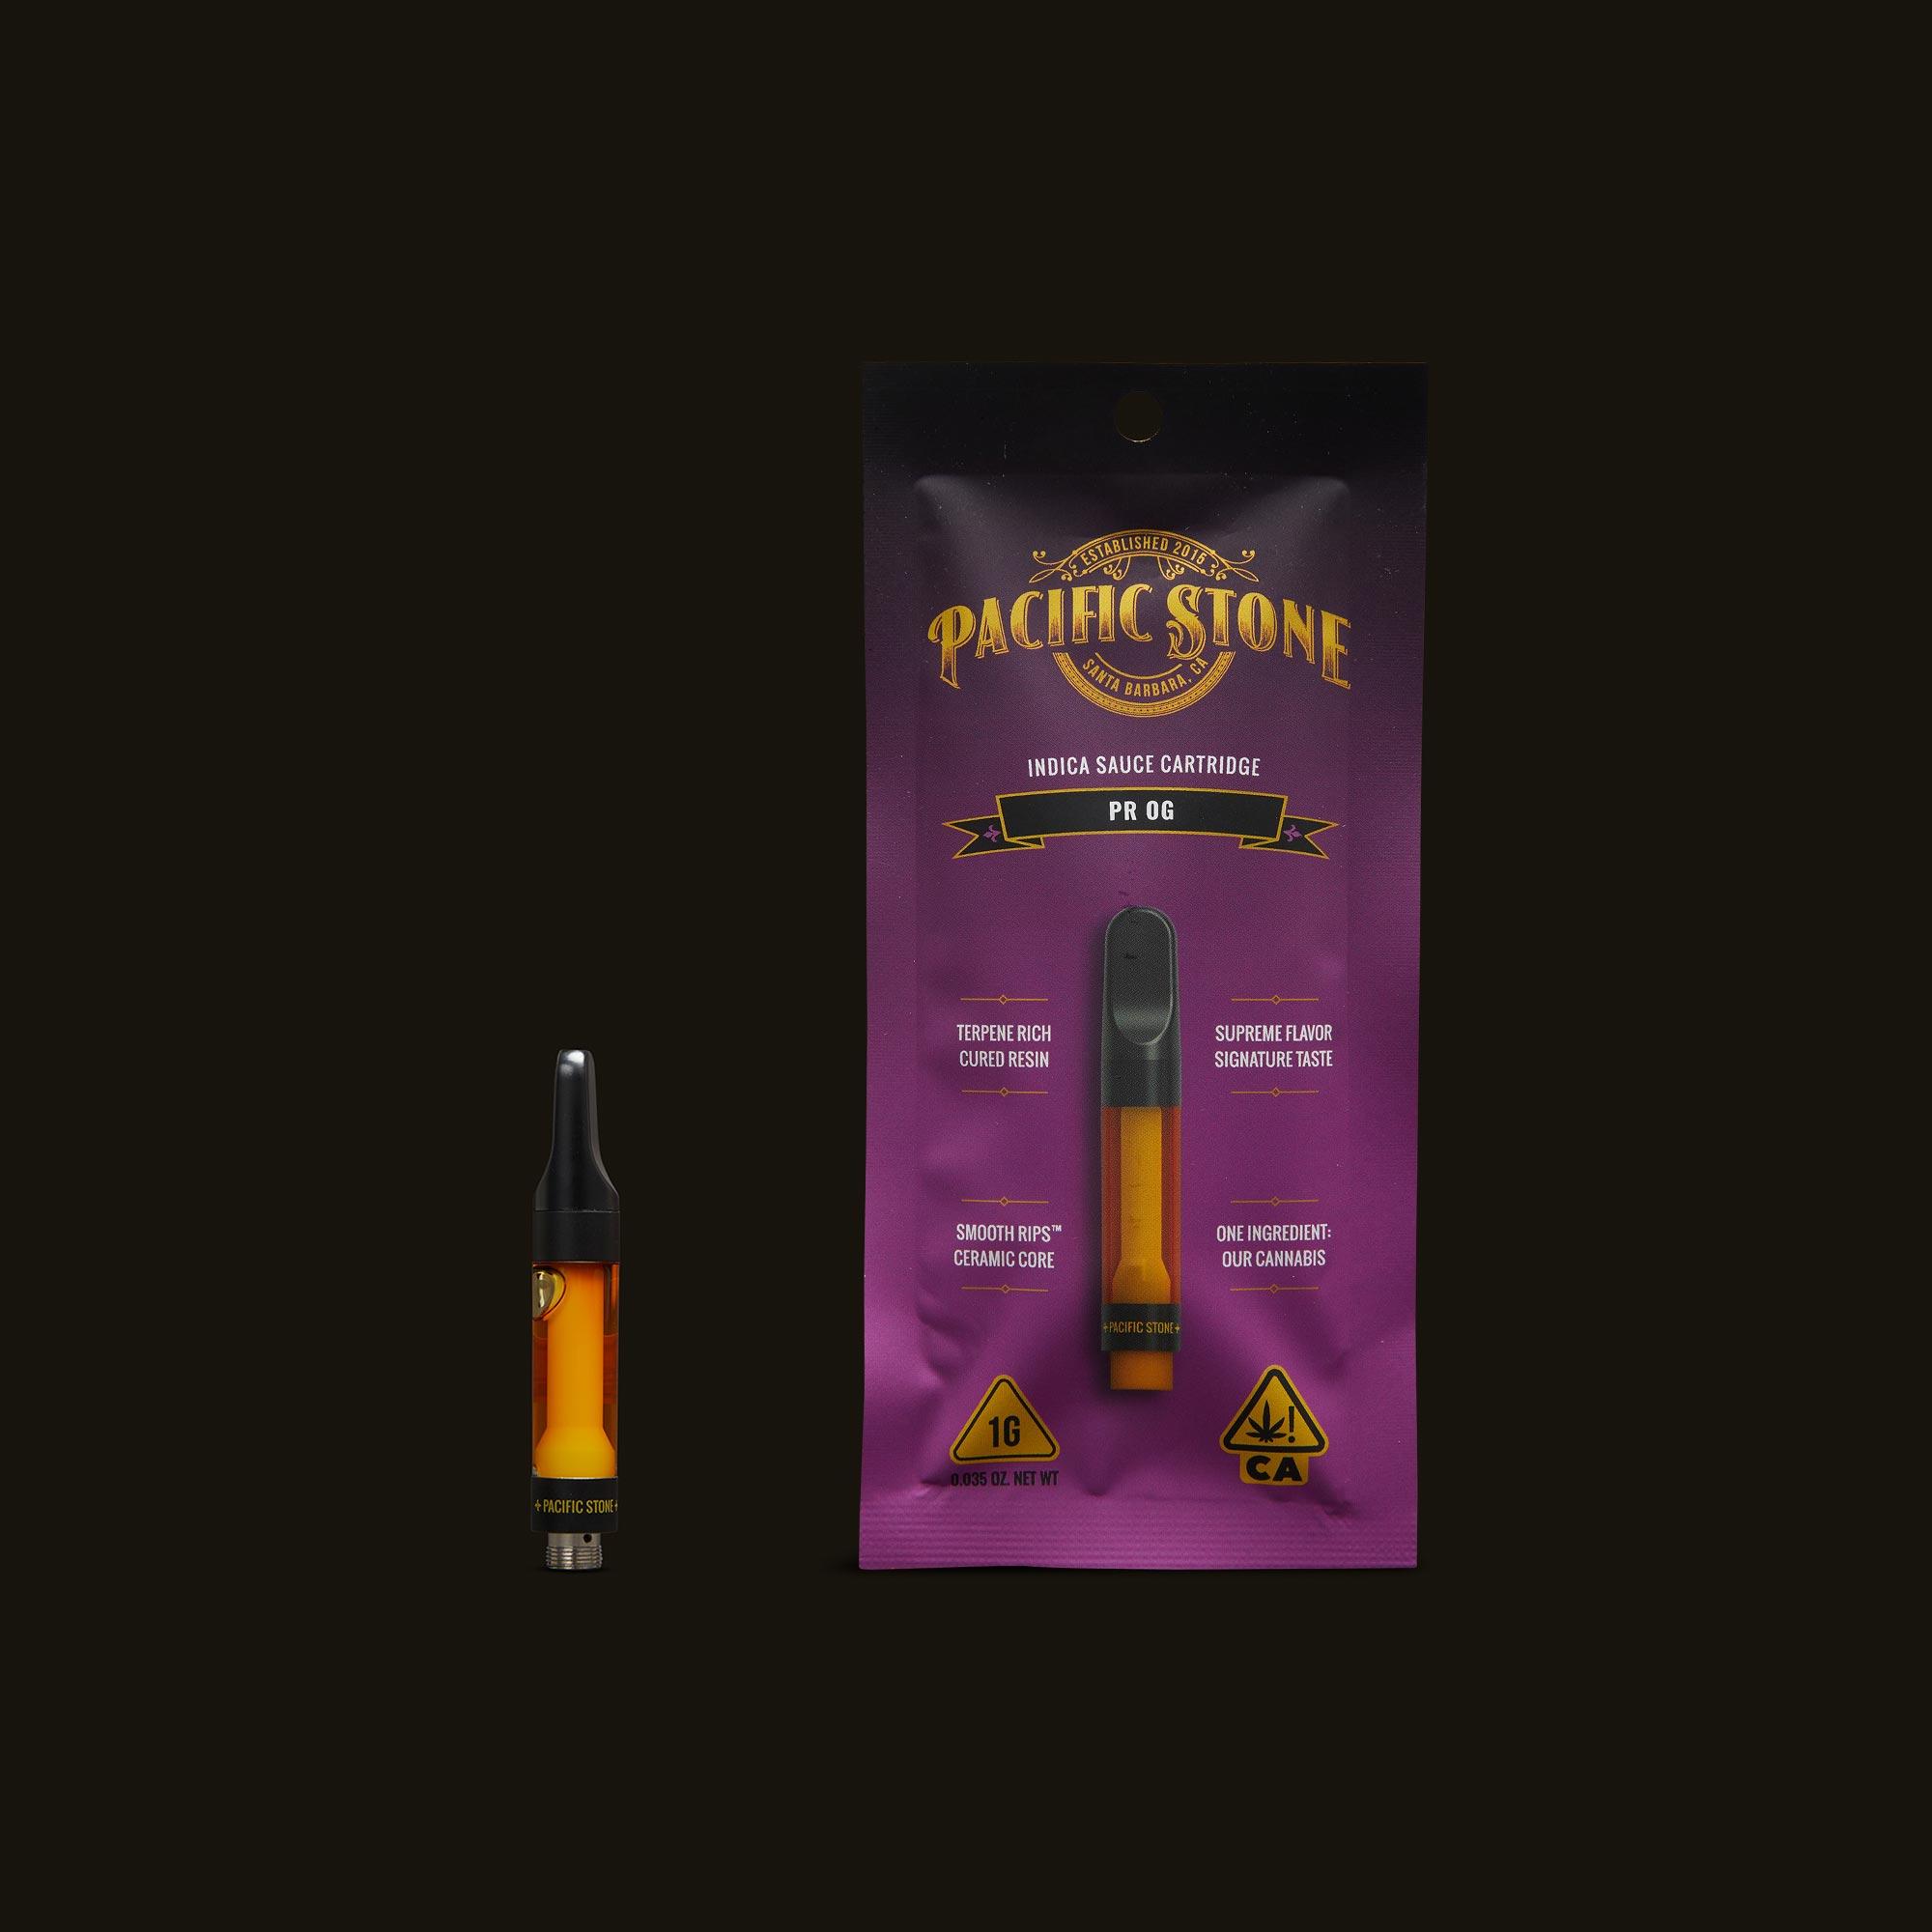 Pacific Stone PR OG Cartridge